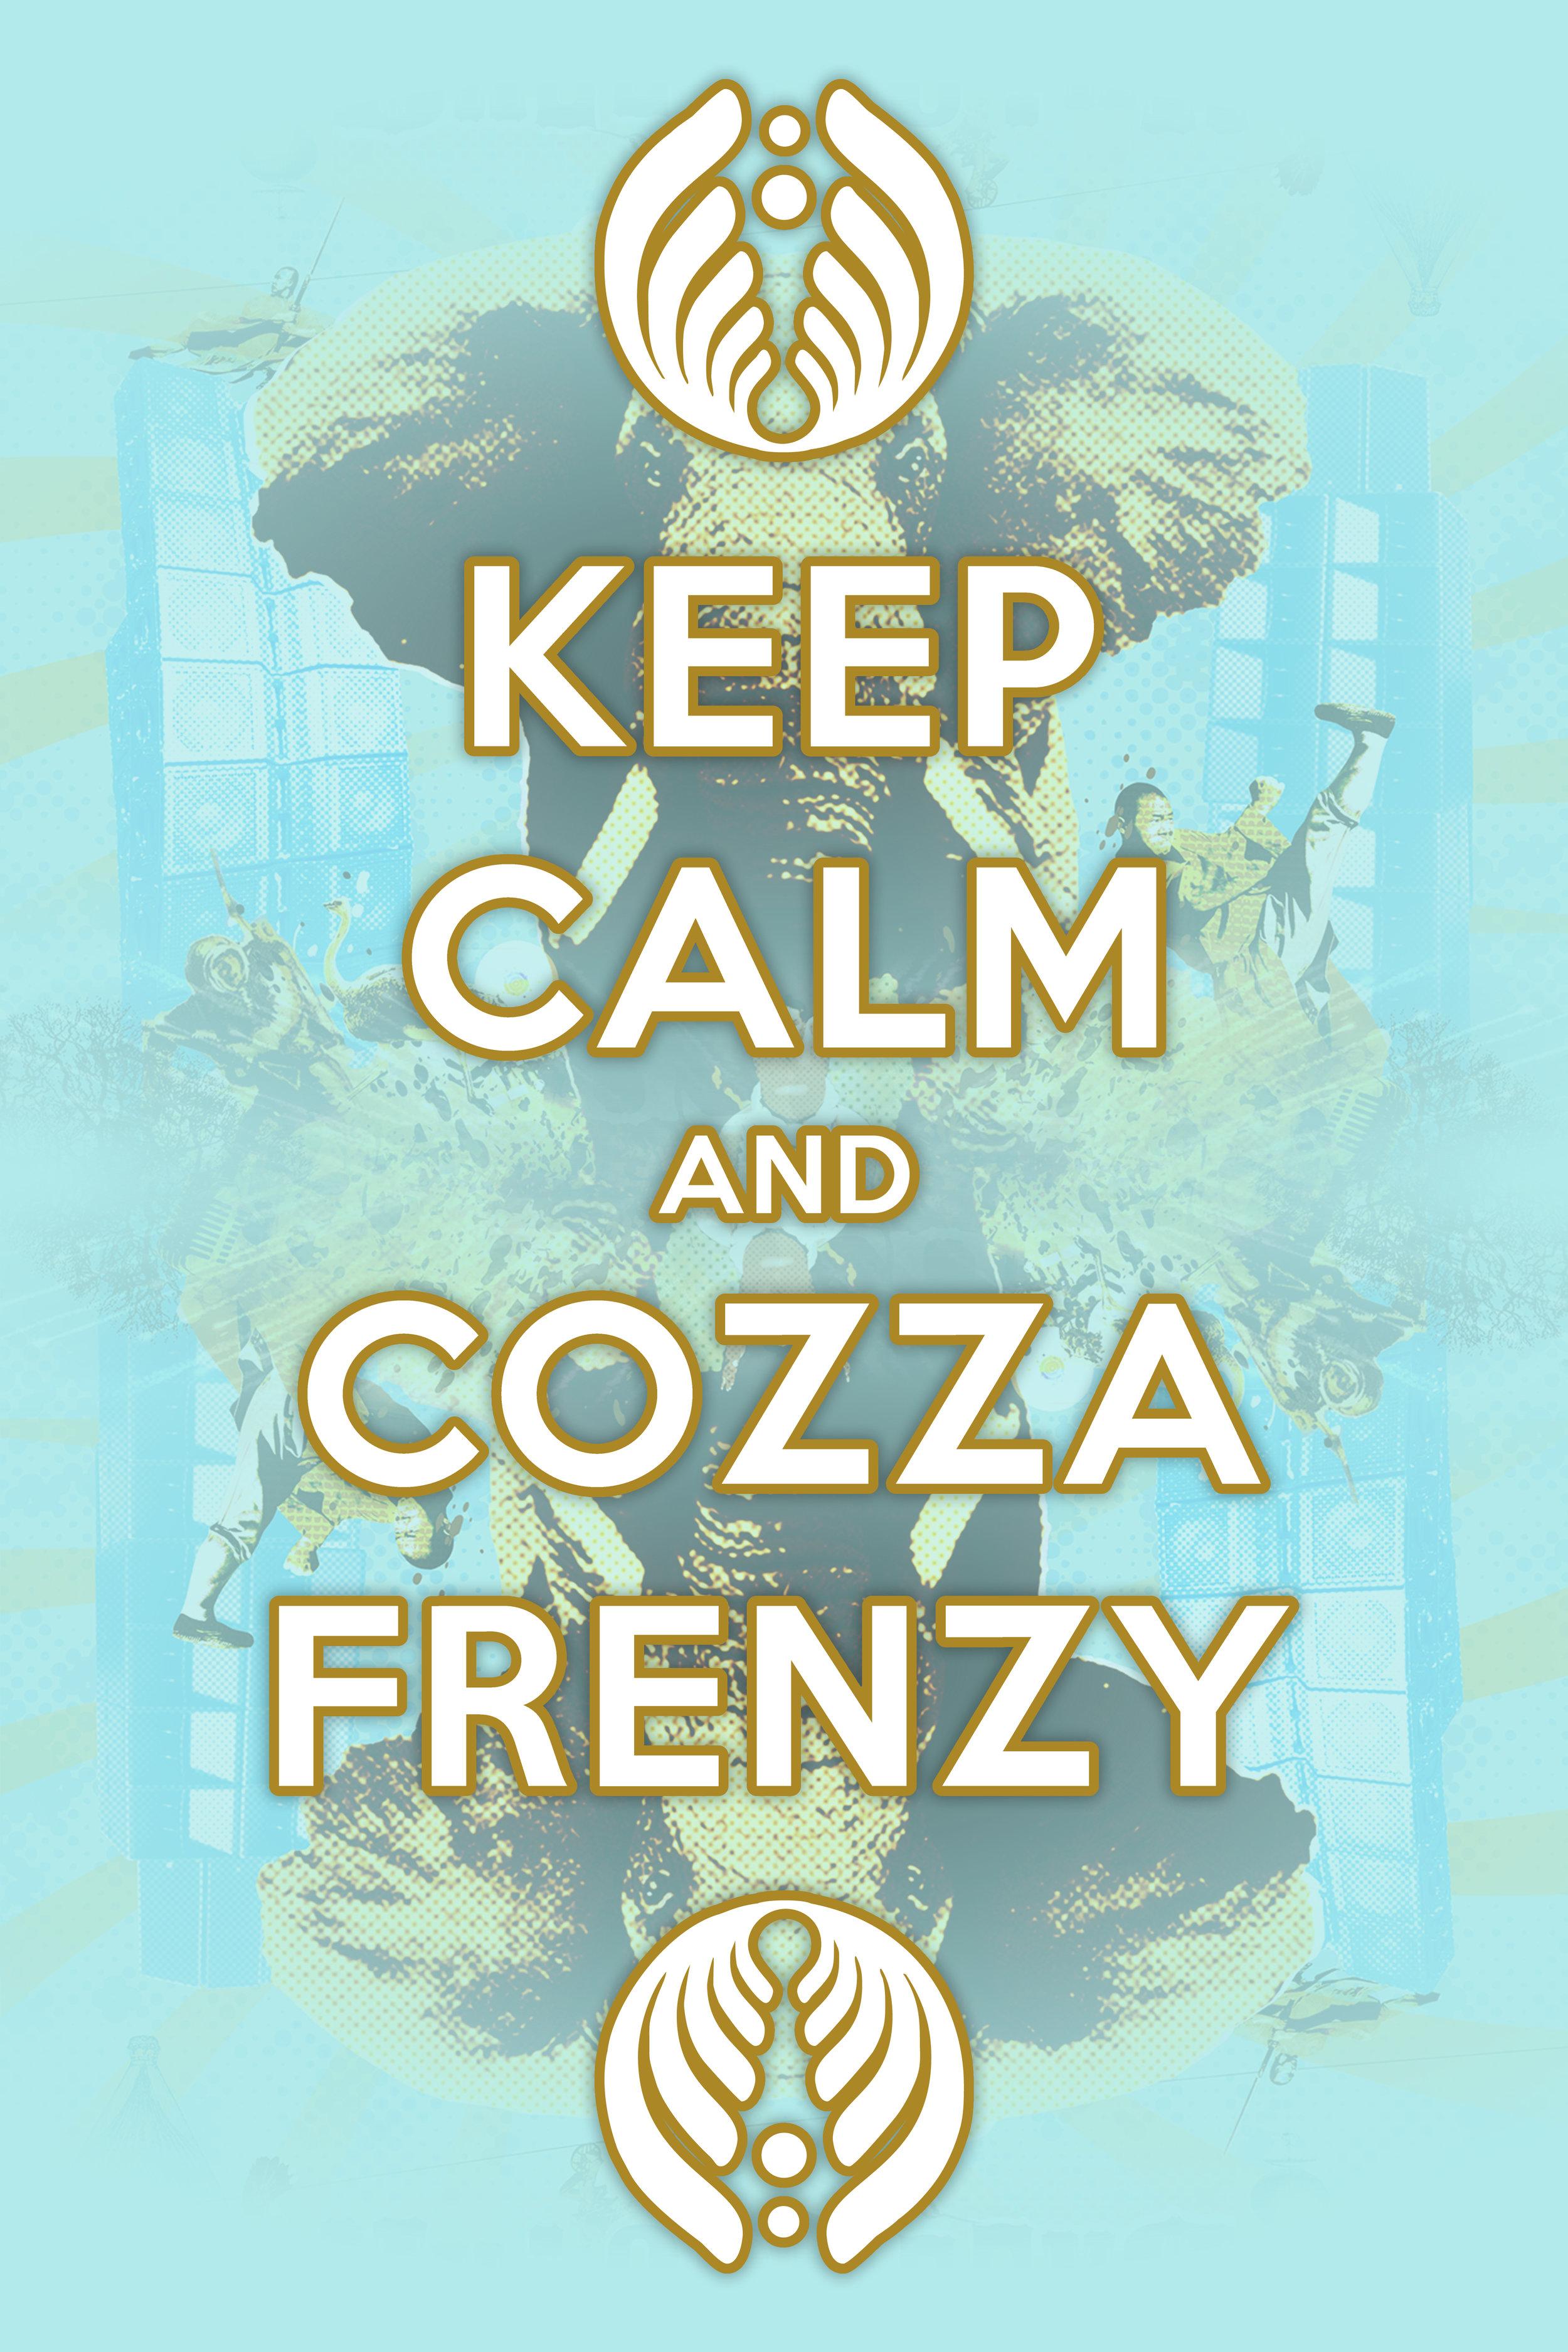 Bassnectar - Cozza Frenzy Poster